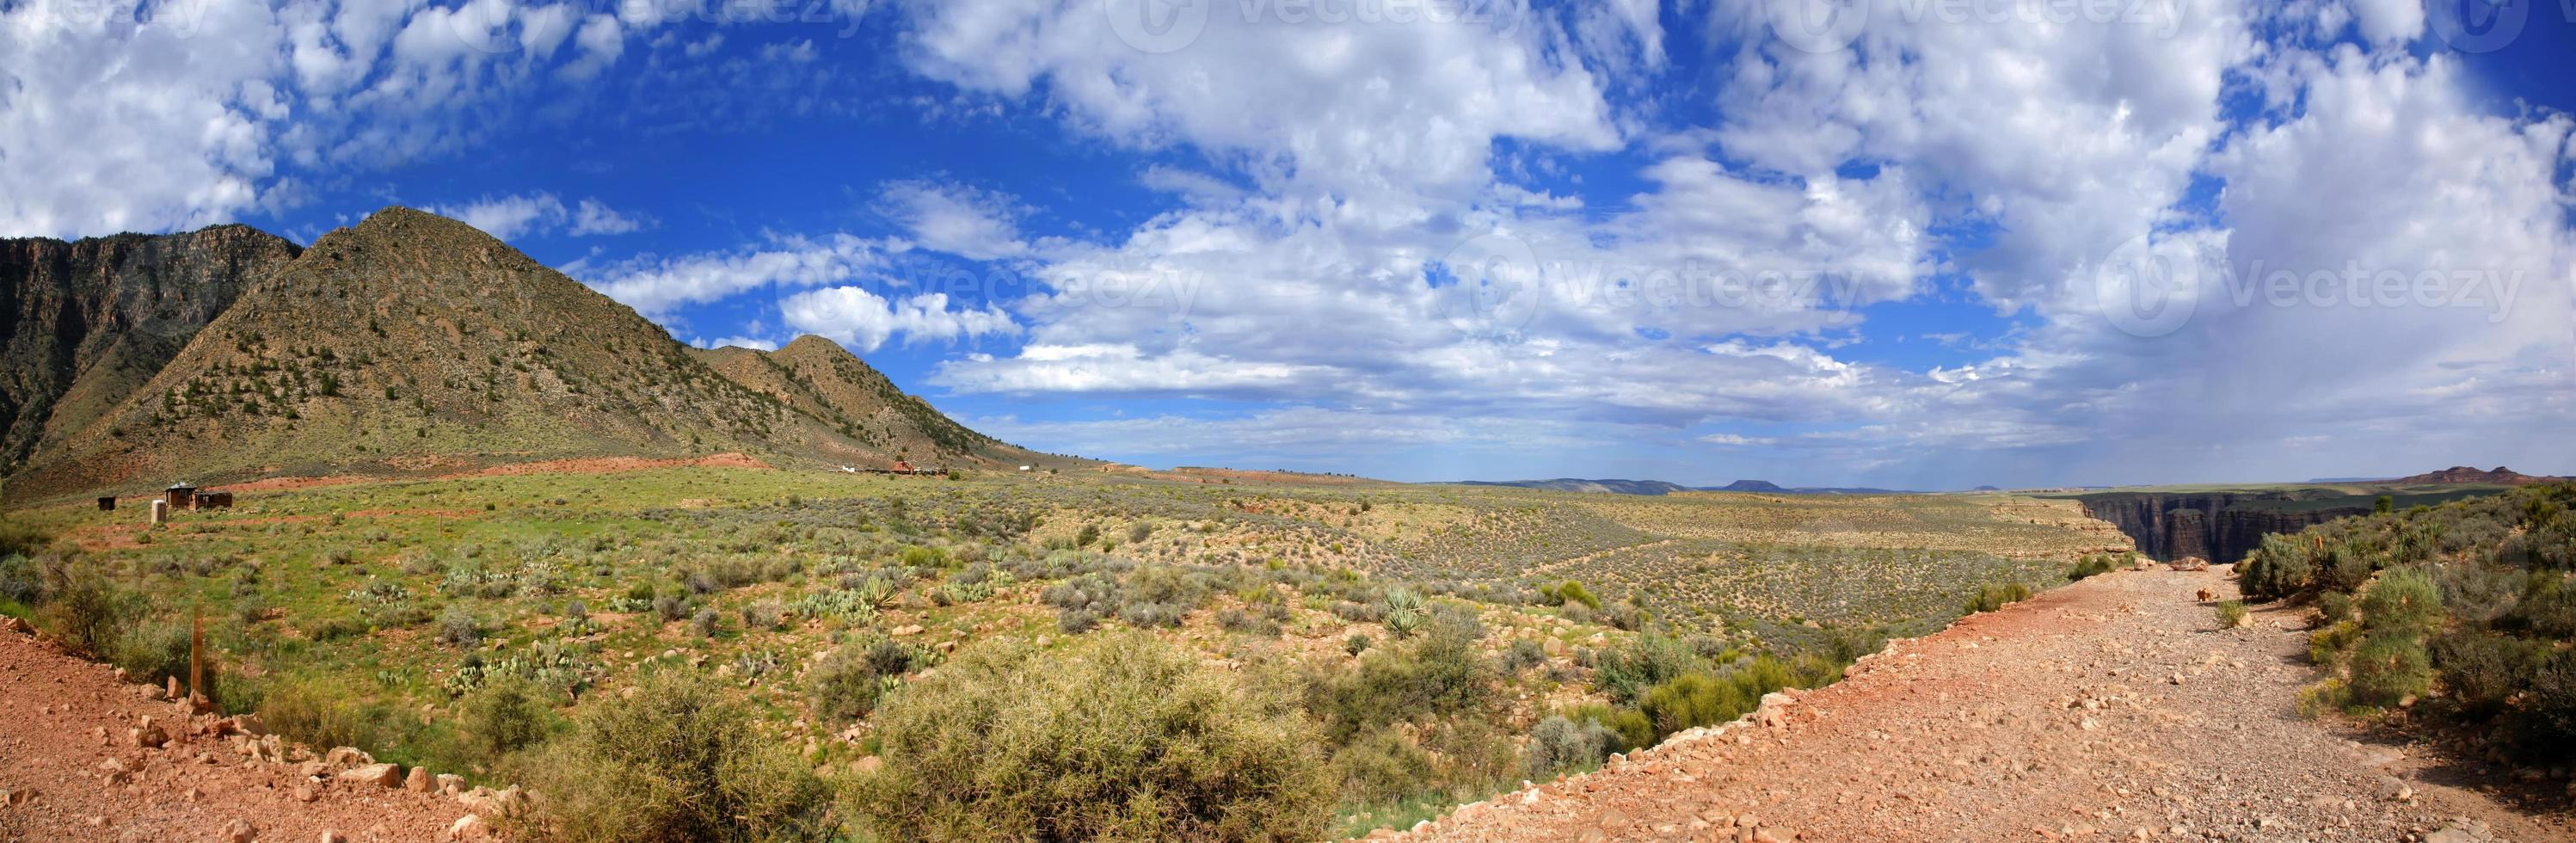 deserto do arizona - eua foto